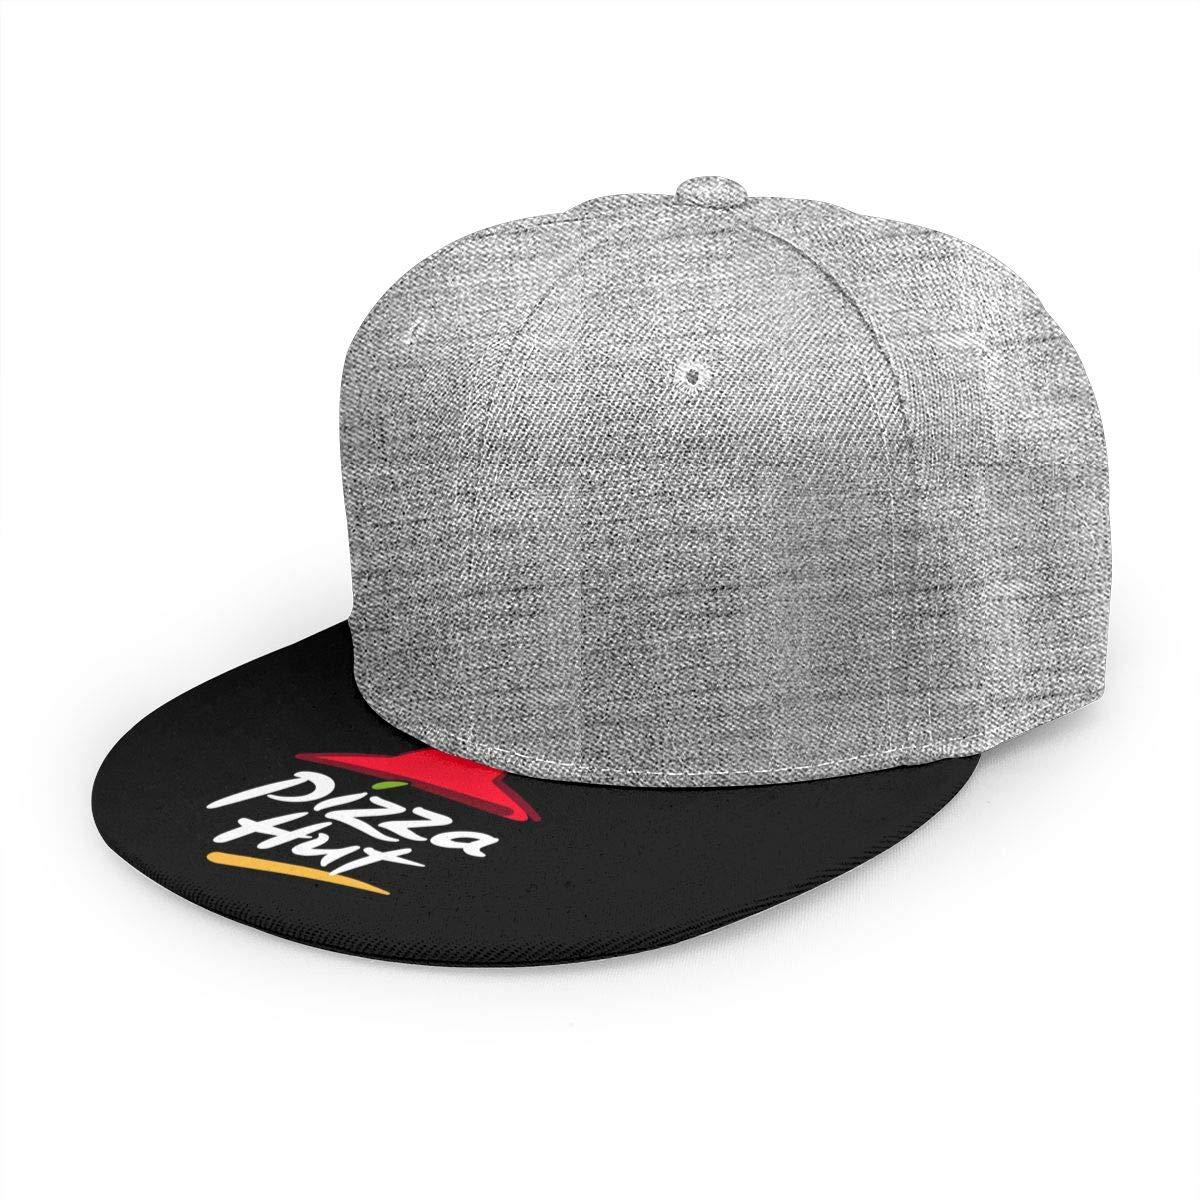 Adjustable Women Men Pizza-Hut-Logo Print Baseball Cap Flat Brim Cap Hats Hip Hop Snapback Sun Hat Boys Girls Gray by Apolonia